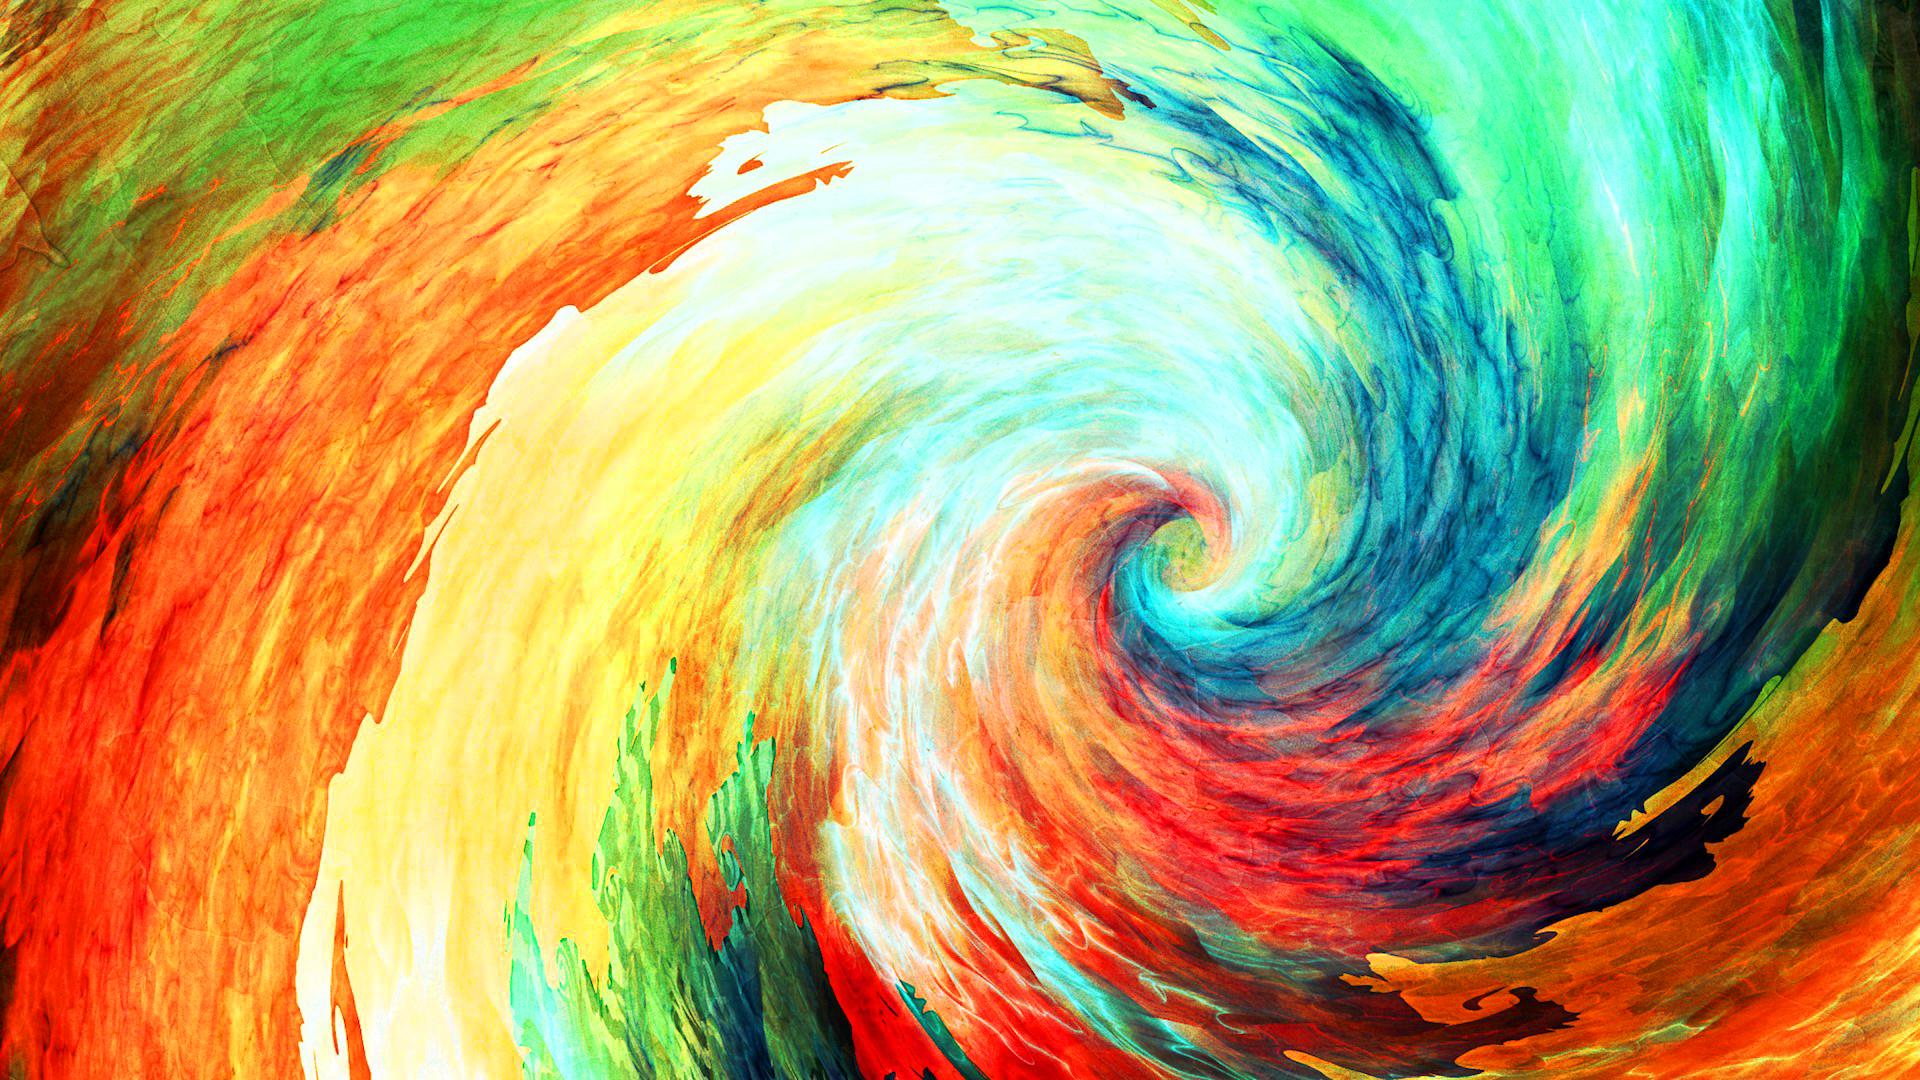 Multicolor spirals